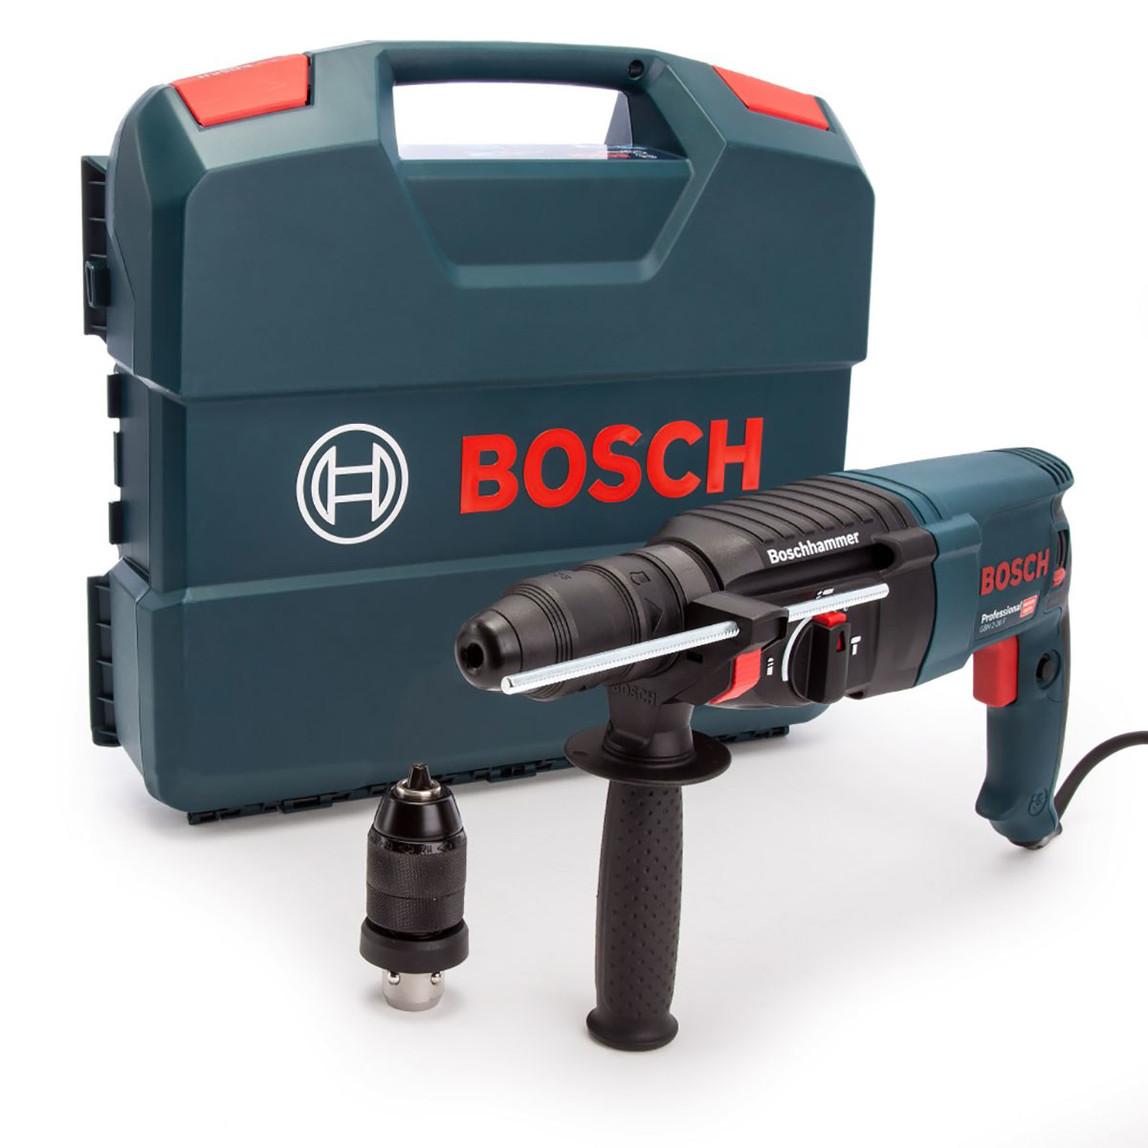 Bosch GBH 2-28 DFV Profesyonel 850W SDS-Plus Kırıcı Delici